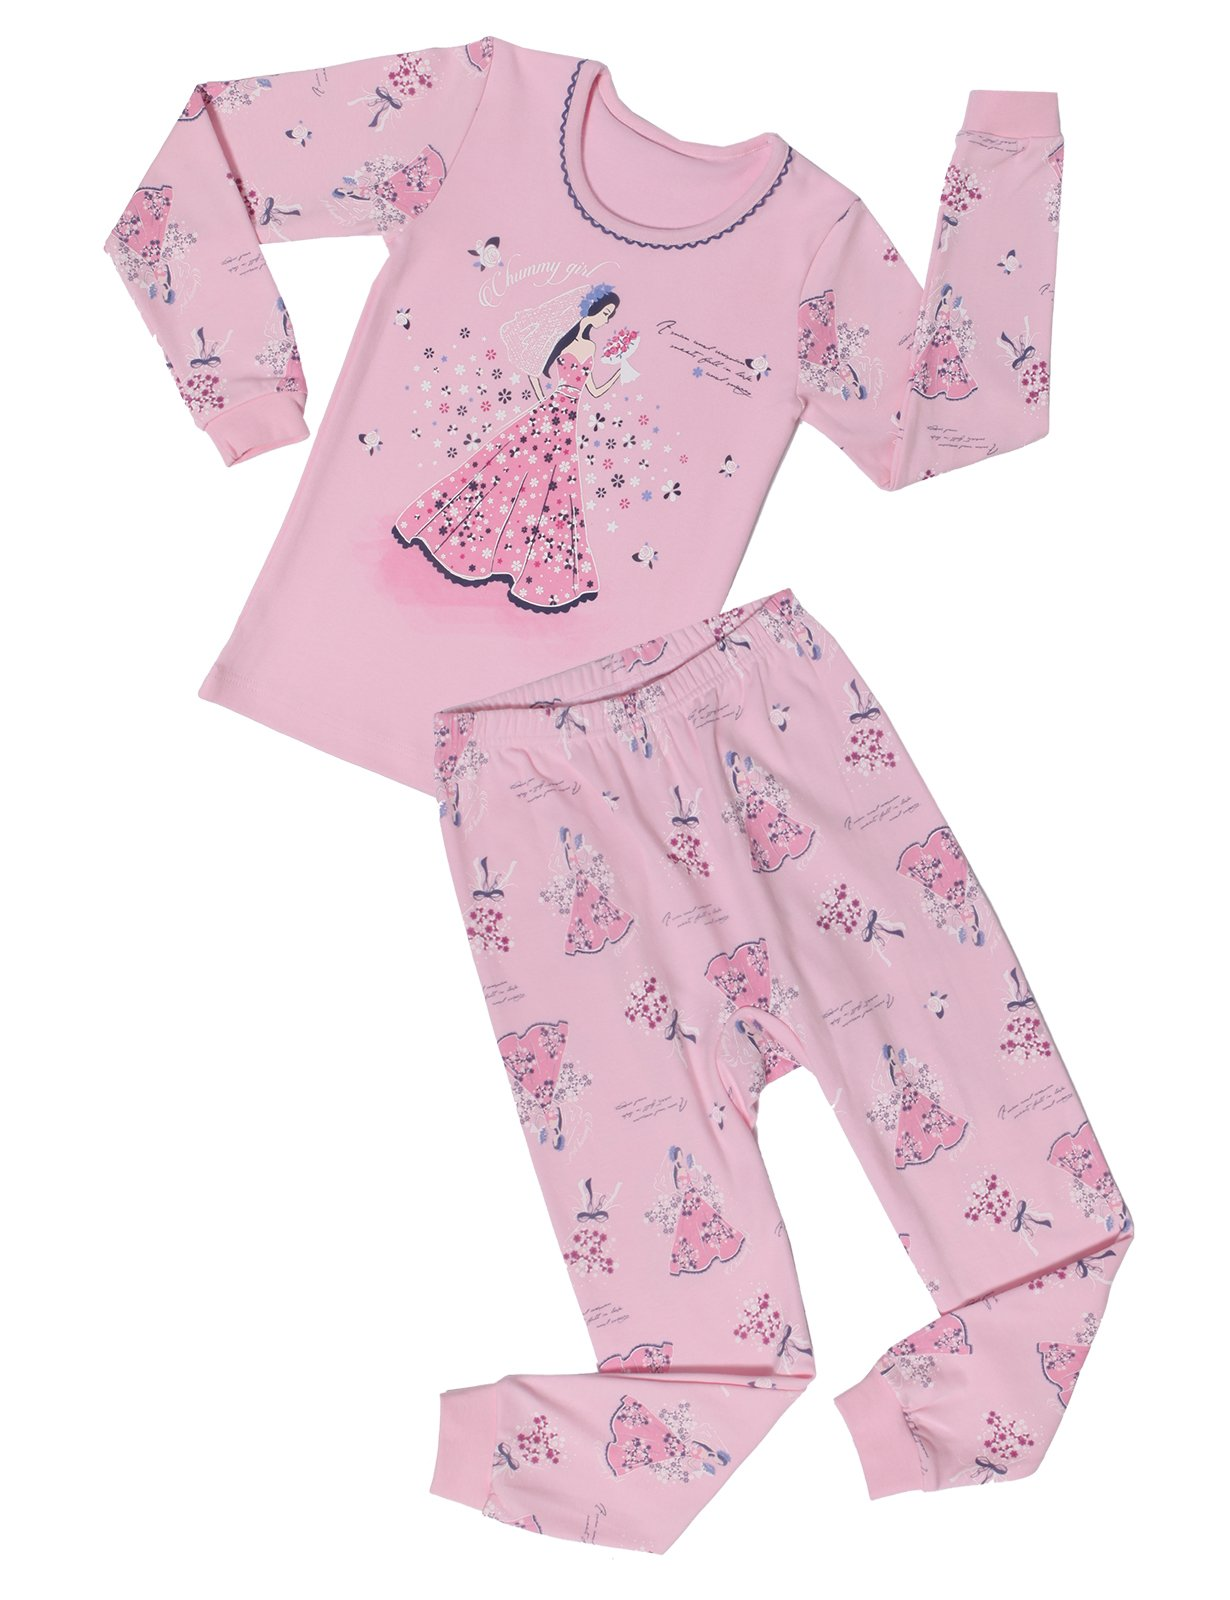 ChummyChummy Pajamas Big Girls Pjs Sets Wedding Day US 7~8Y/Asia 70 (KGSPJ04)